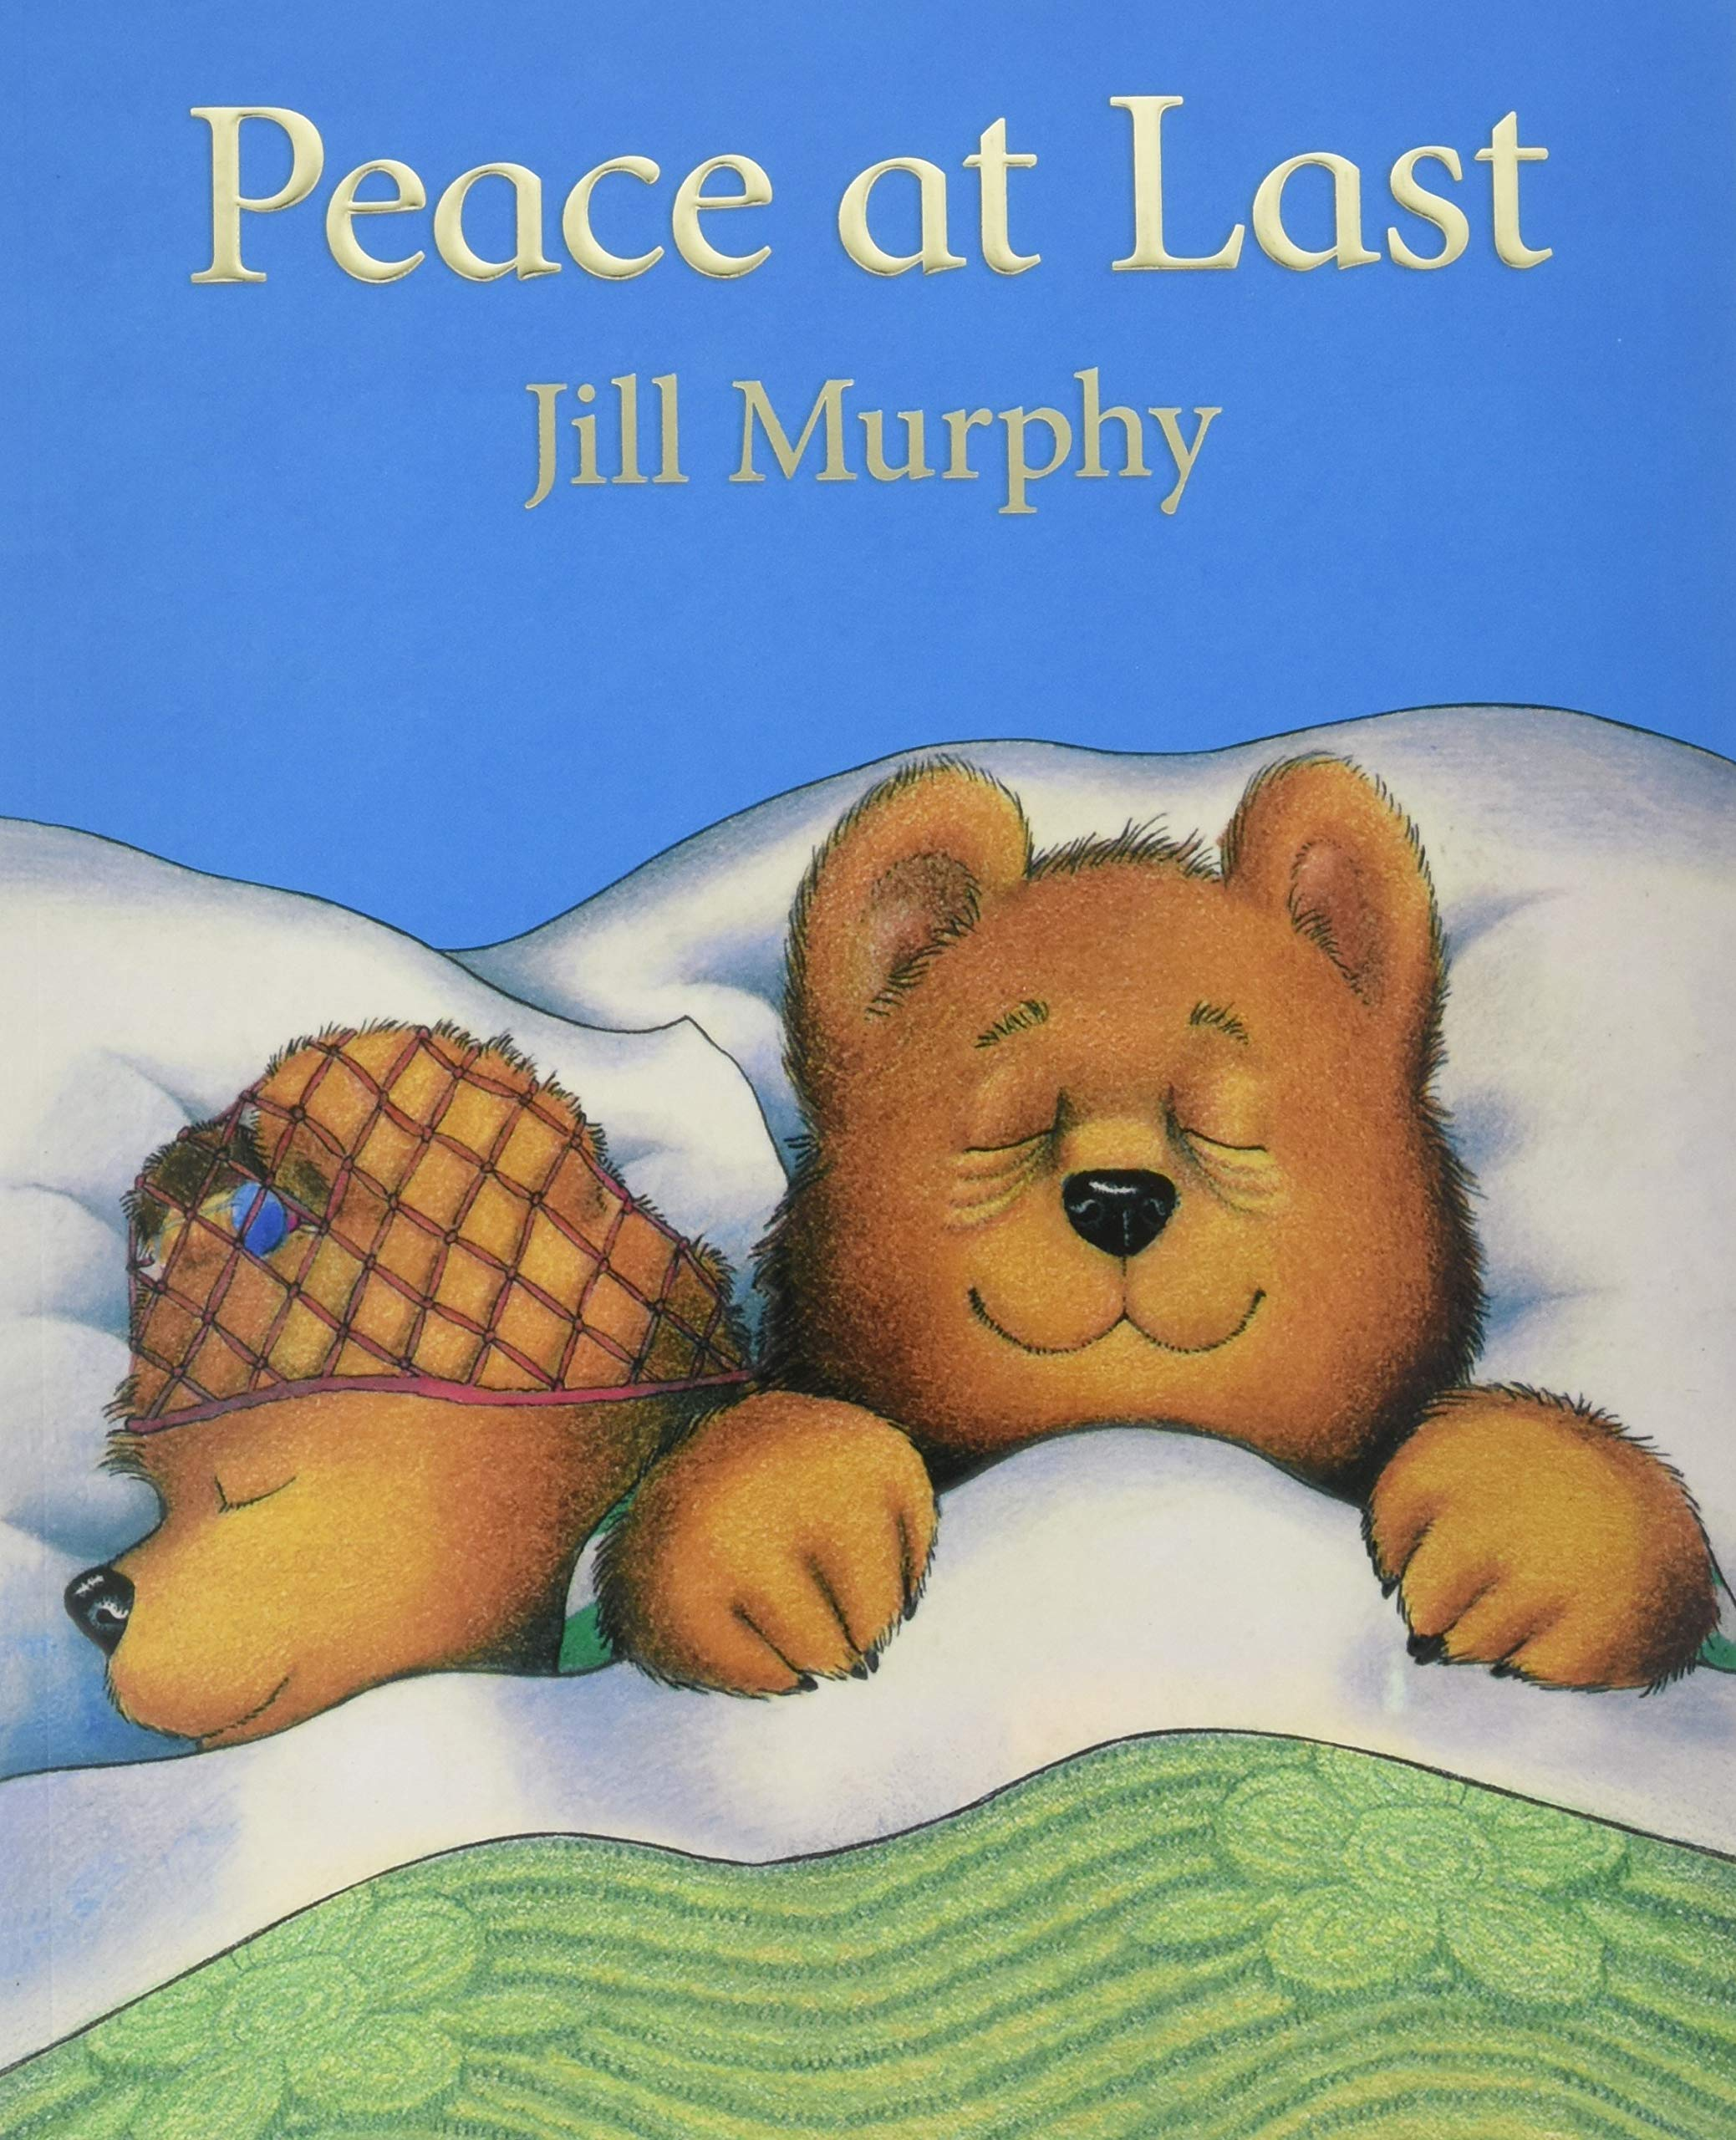 Peace at Last - The Rocketship Bookshop